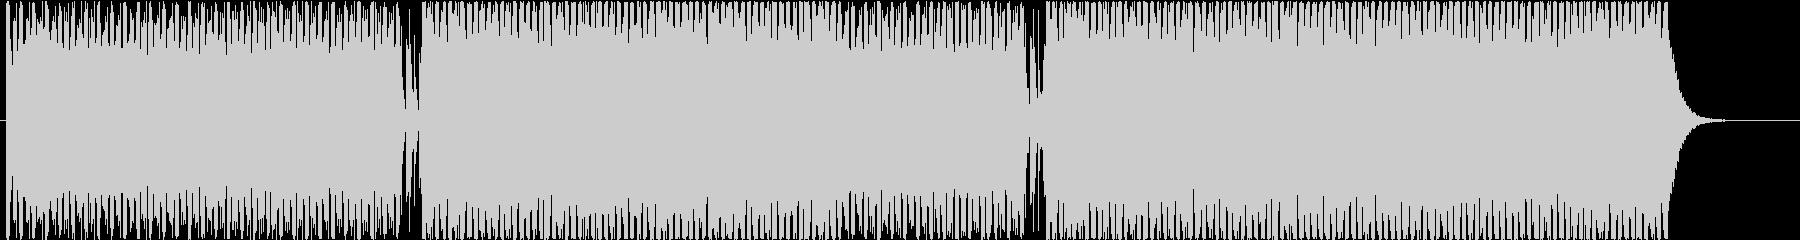 EDM系インストの未再生の波形